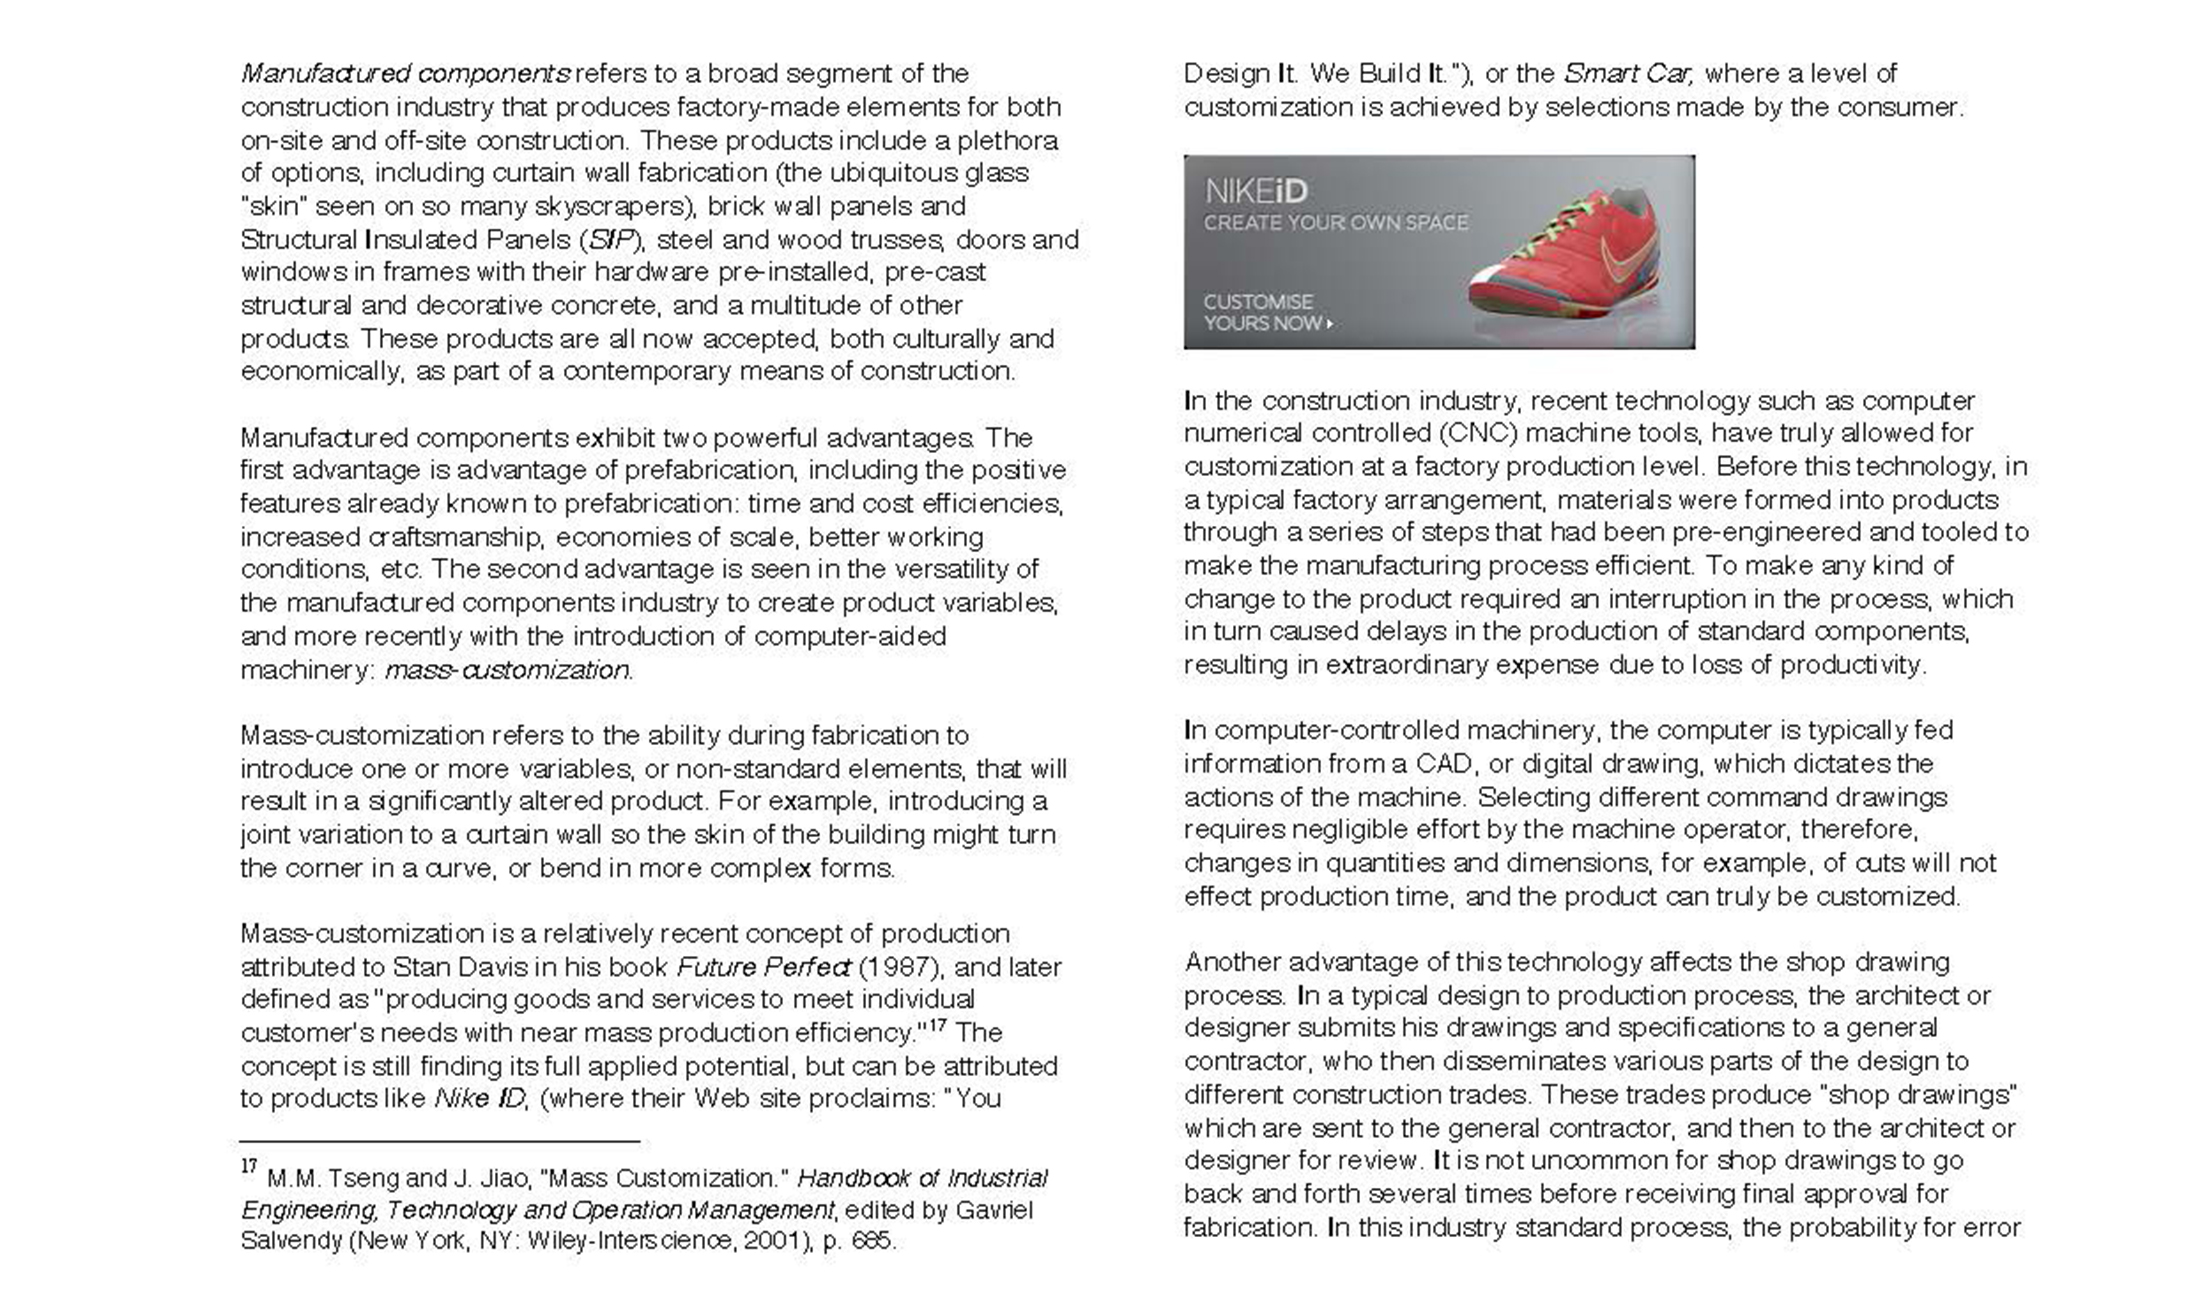 Maciunas Assessment Report 0509_Page_17.jpg